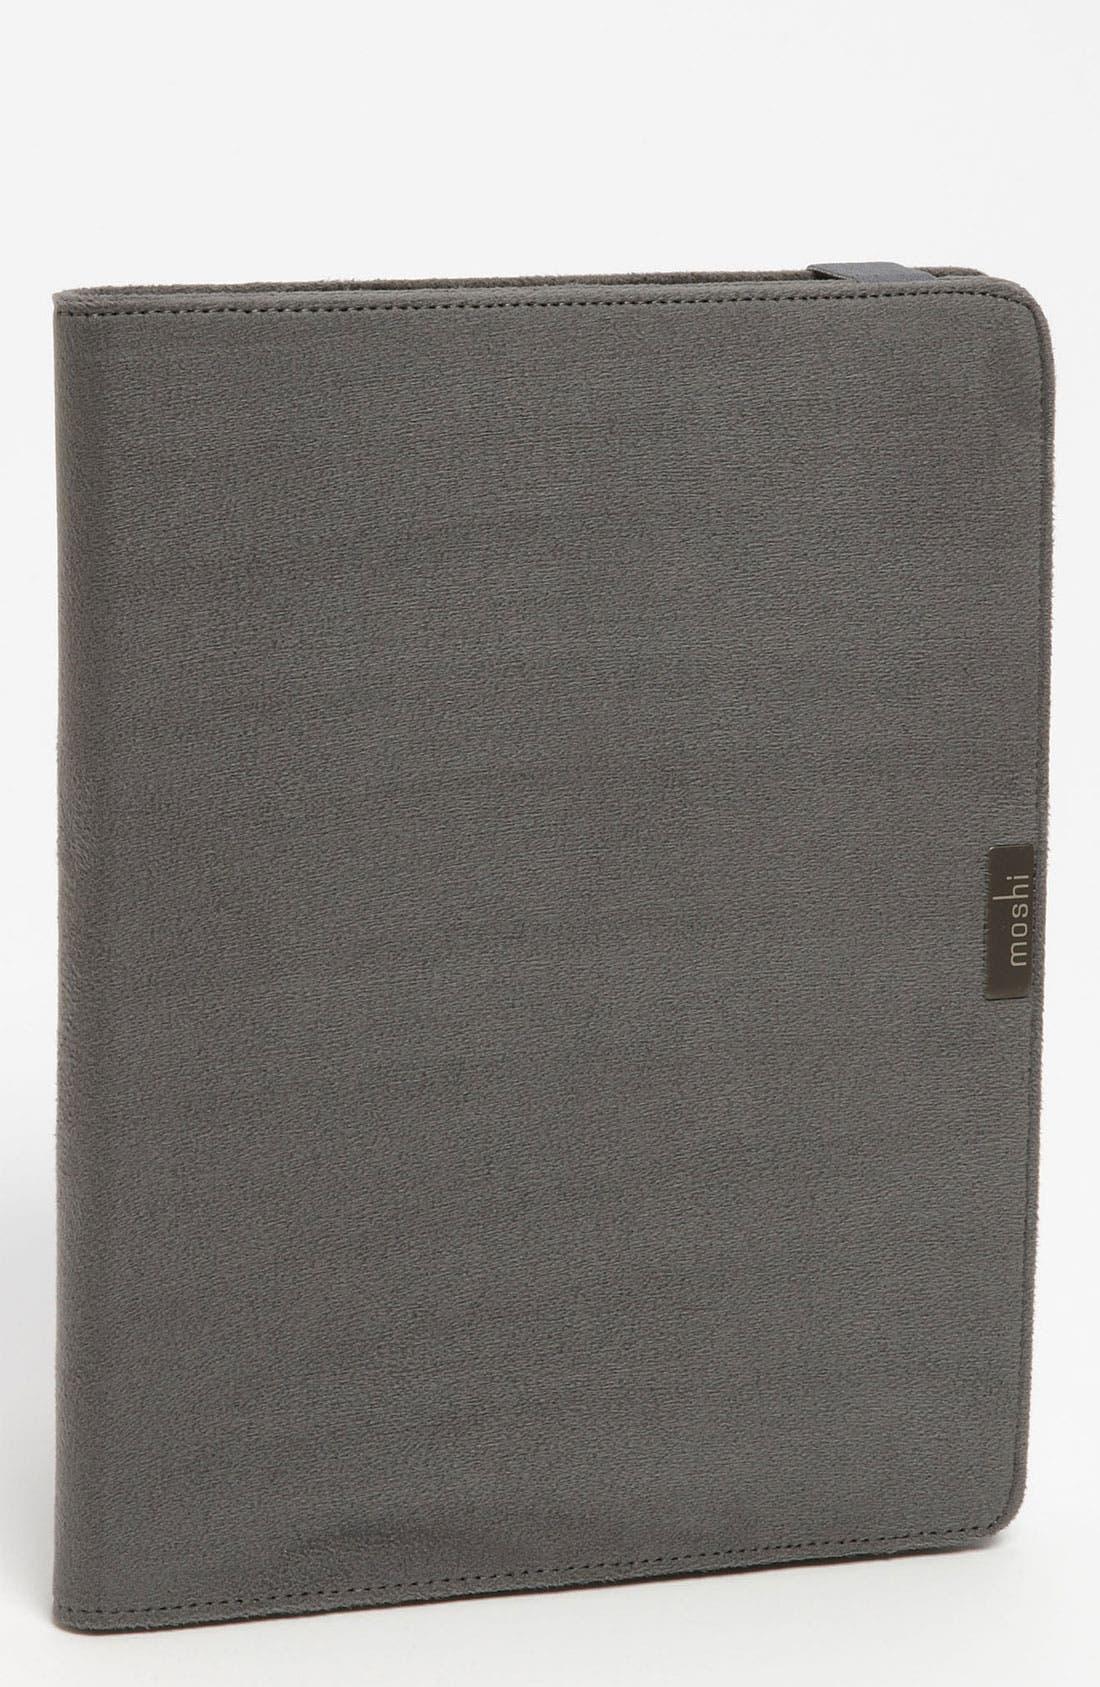 Alternate Image 1 Selected - Moshi 'Concerti' iPad 3 Portfolio Case